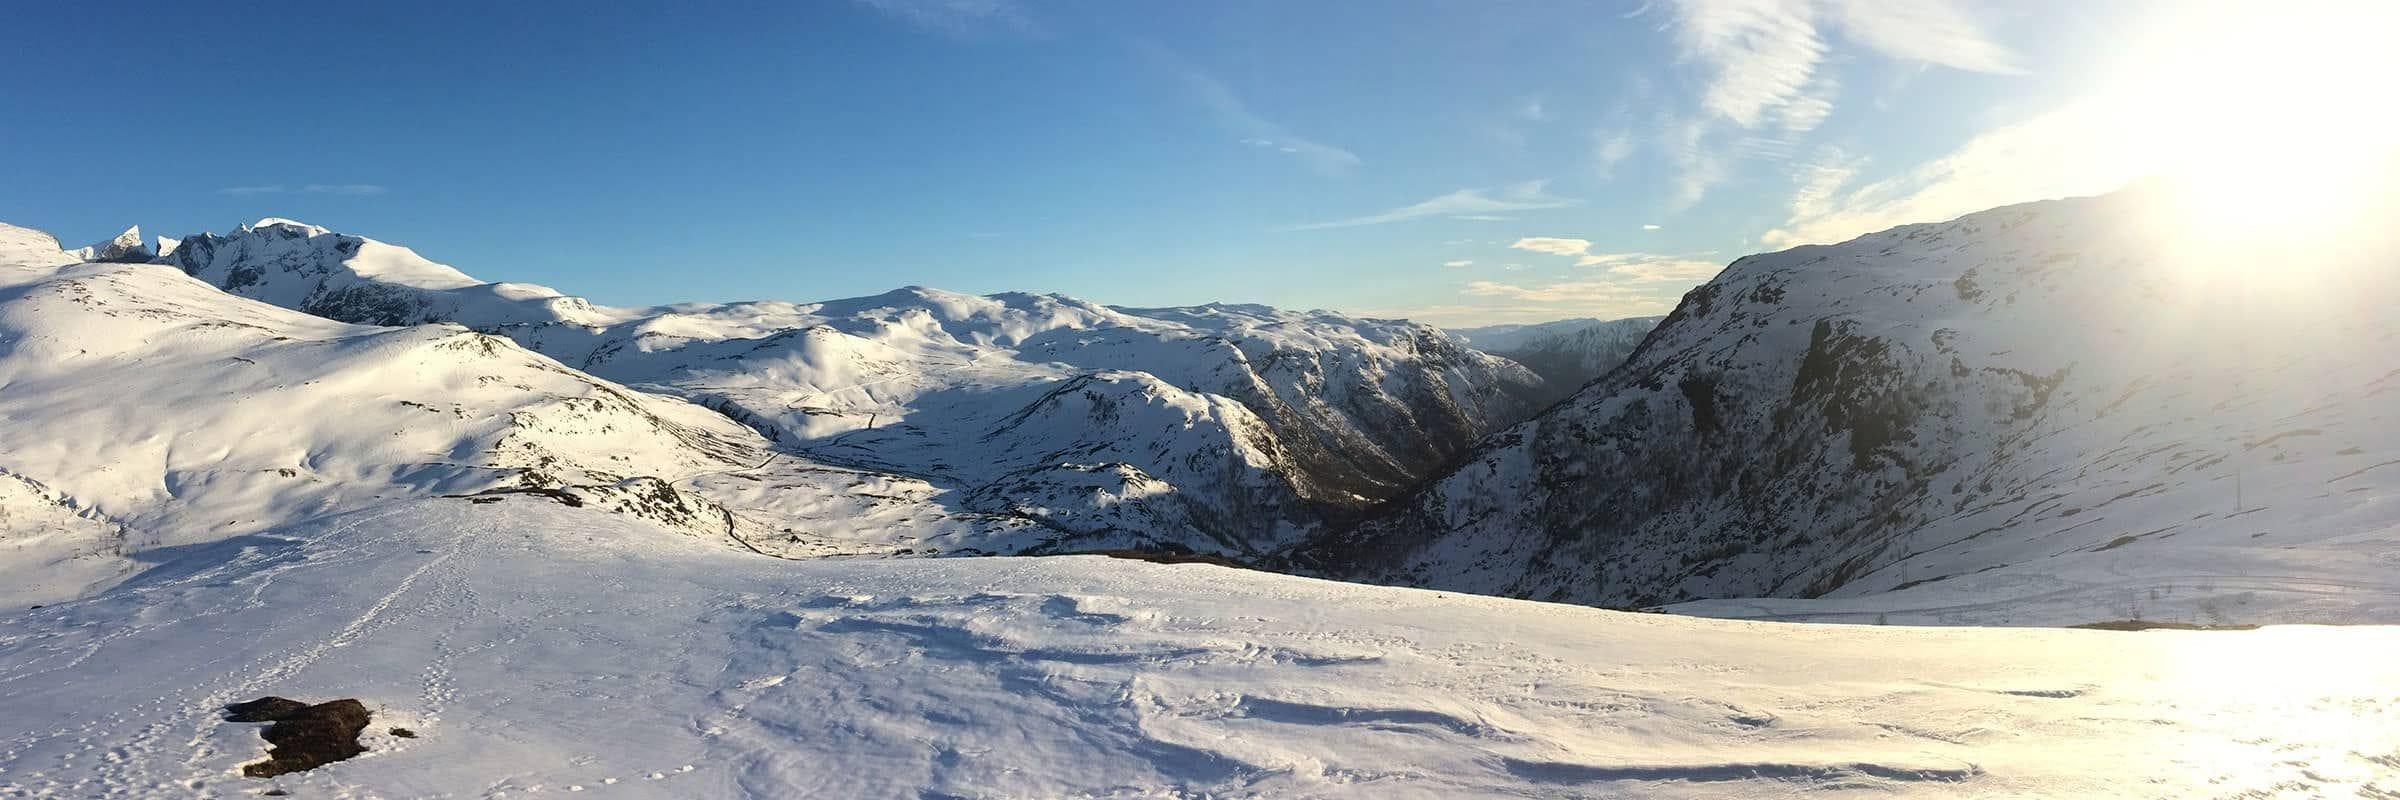 Norrona, Ski & Snowboard. Norrøna: High Camp Turtagrø 2017 Recap